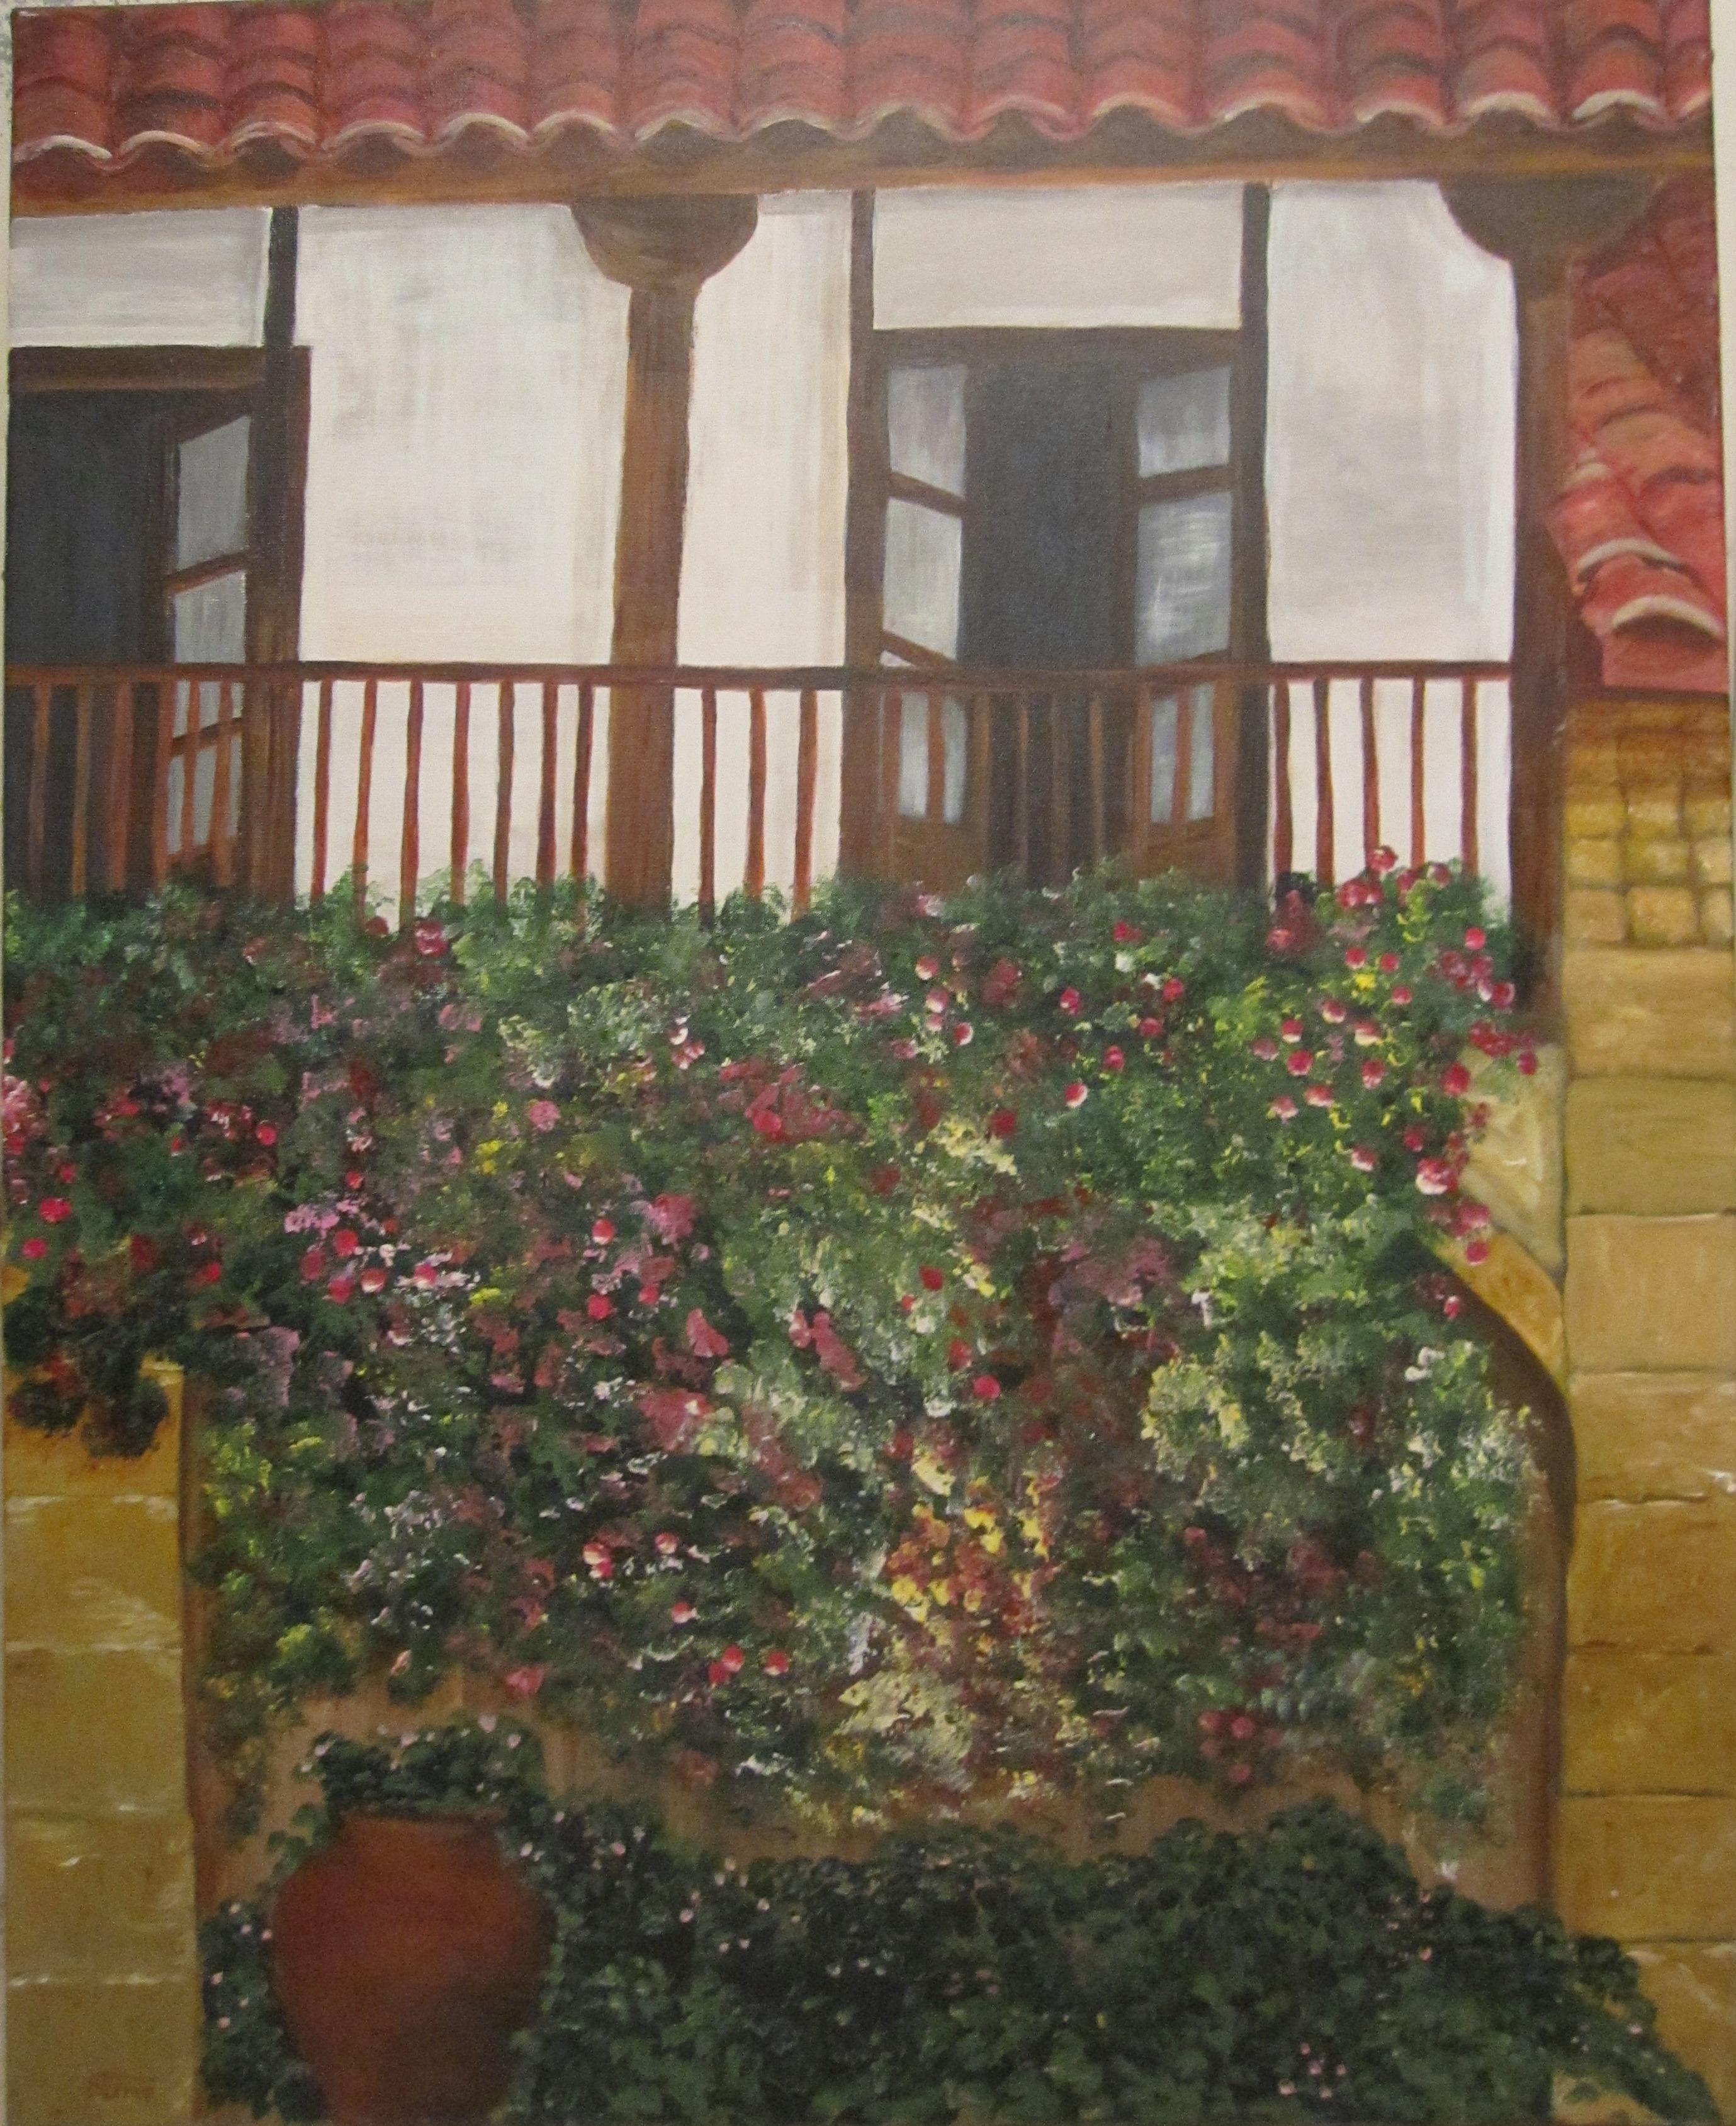 Acr lico sobre lienzo galeria de pintura manuela ferrer - Acrilico sobre lienzo ...